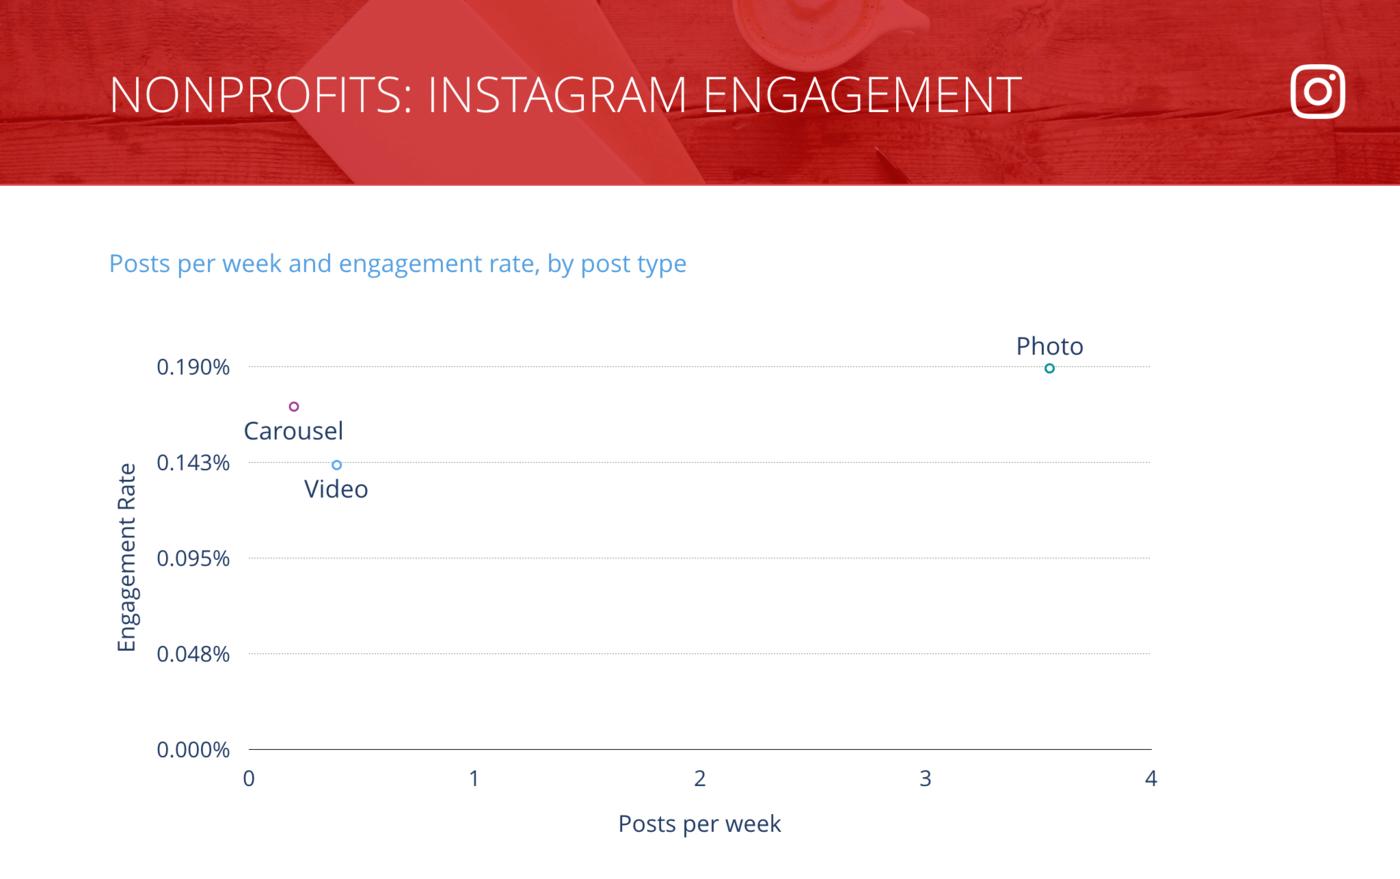 slide of Instagram Posts per Week vs. Engagement Rate per Post, Nonprofit Organizations